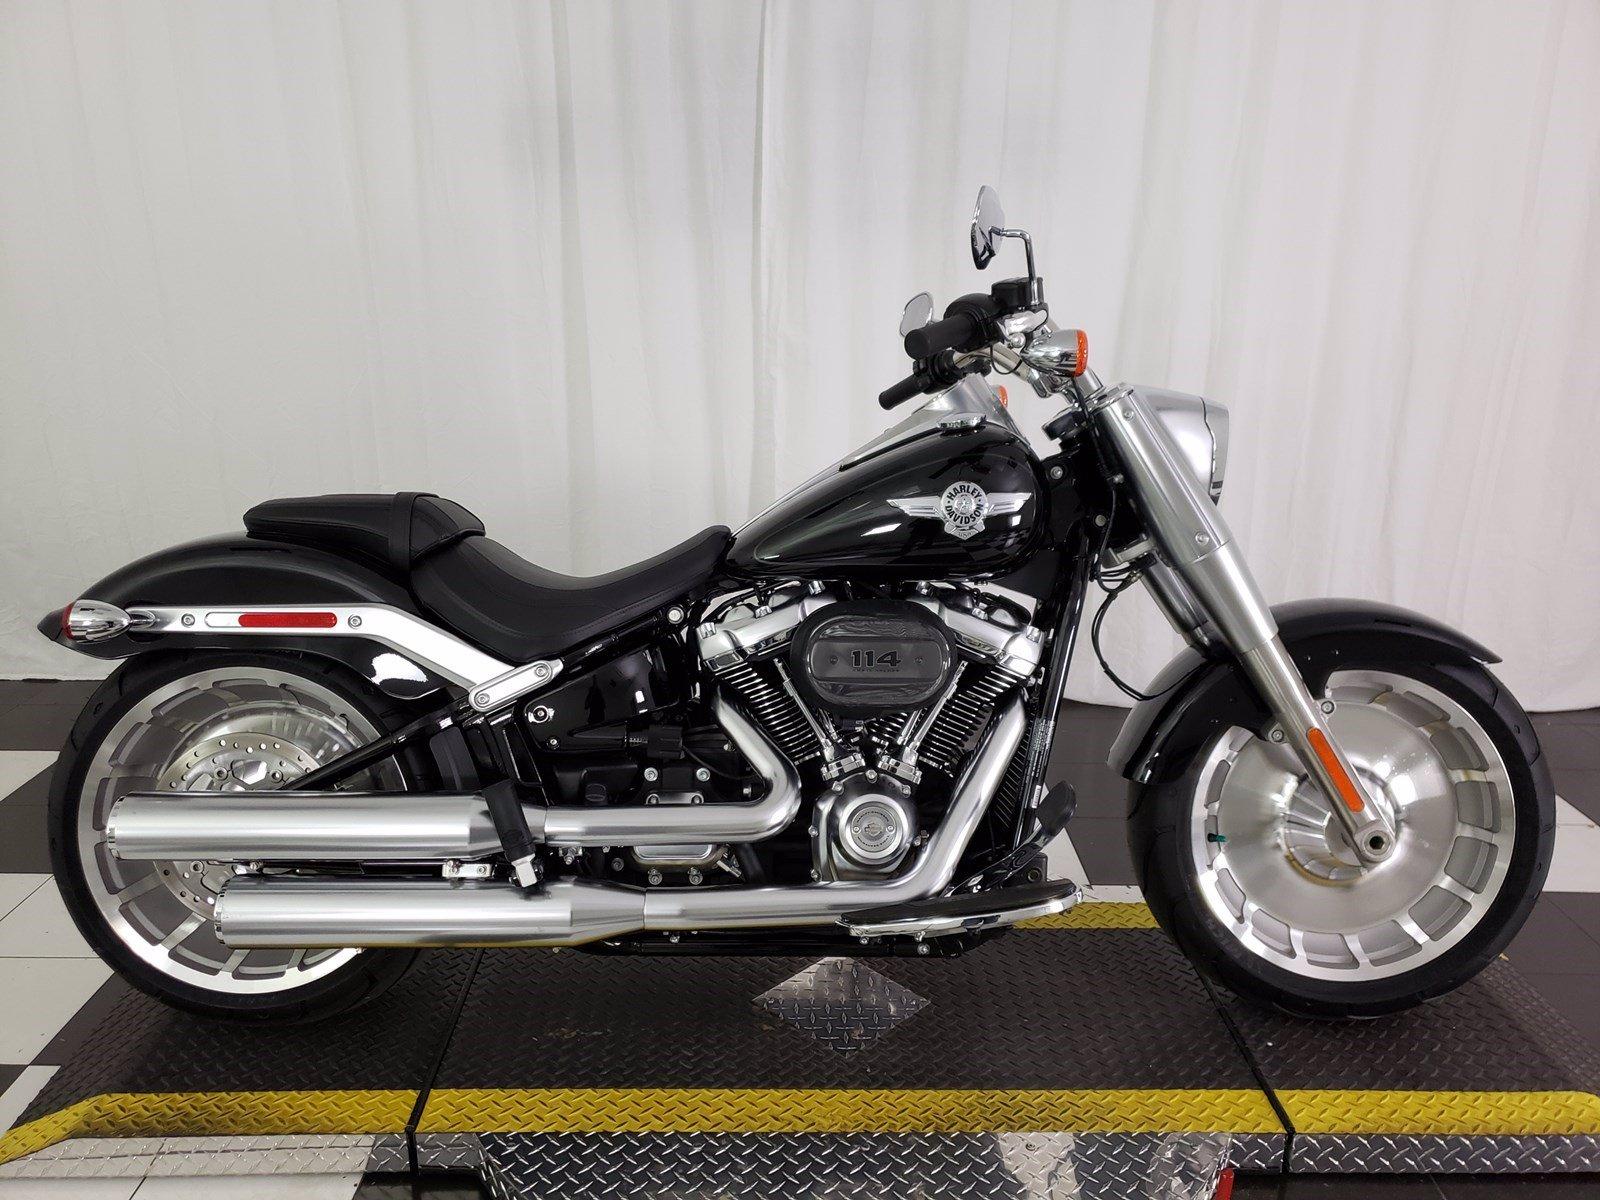 Harley Davidson 2021 in Pakistan - All Bike Models with Details Revealed!